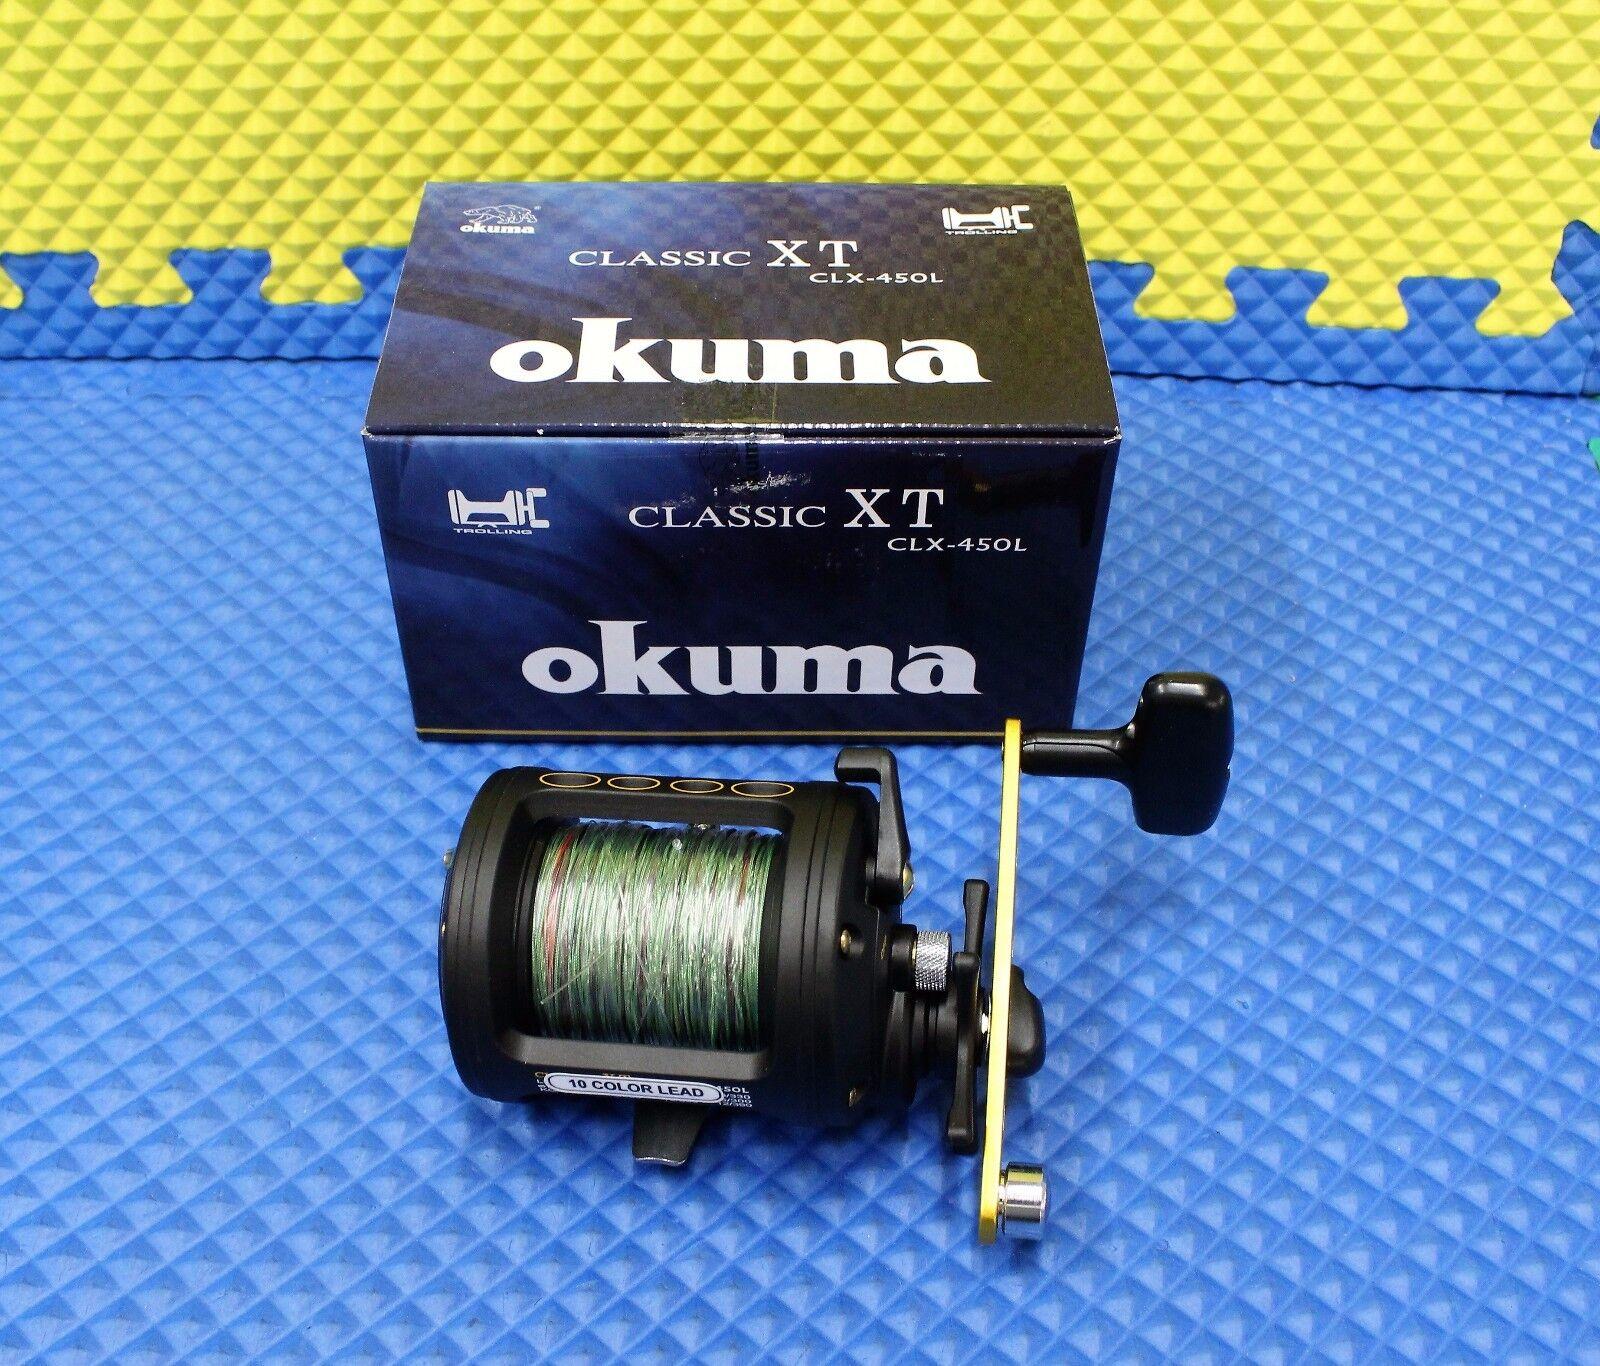 Okuma Classic XT CLX-450L Trolling Reel Pre Spooled with 10 Farbe 27  Lead Core